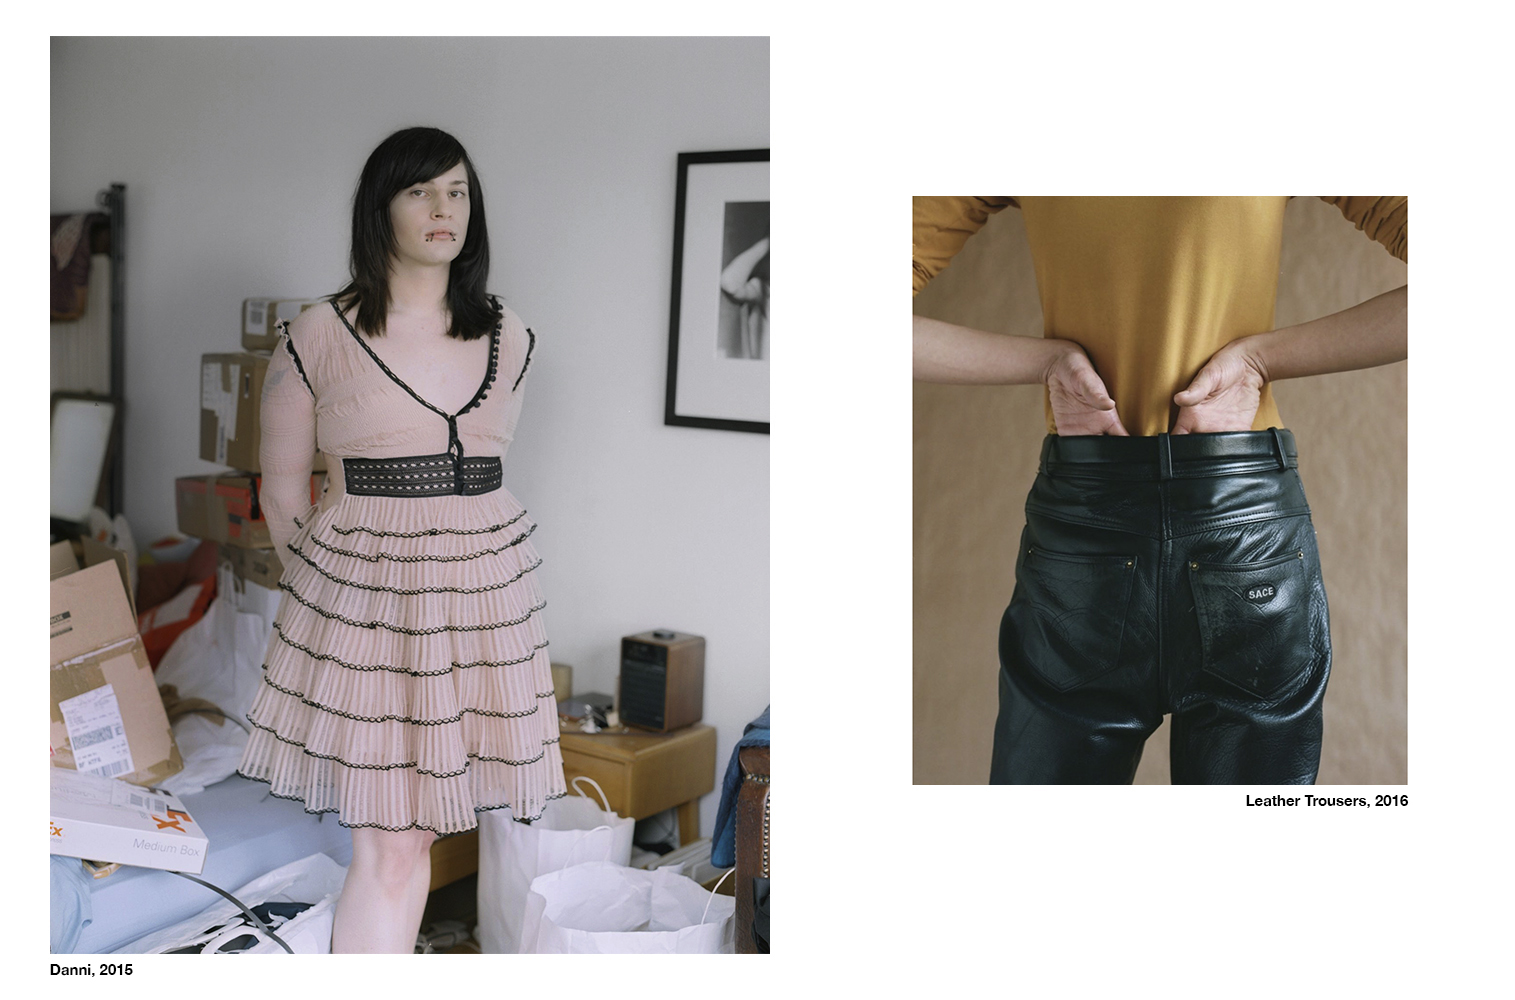 Danni, 2015 – Leather, 2016 Kim Jakobsen To